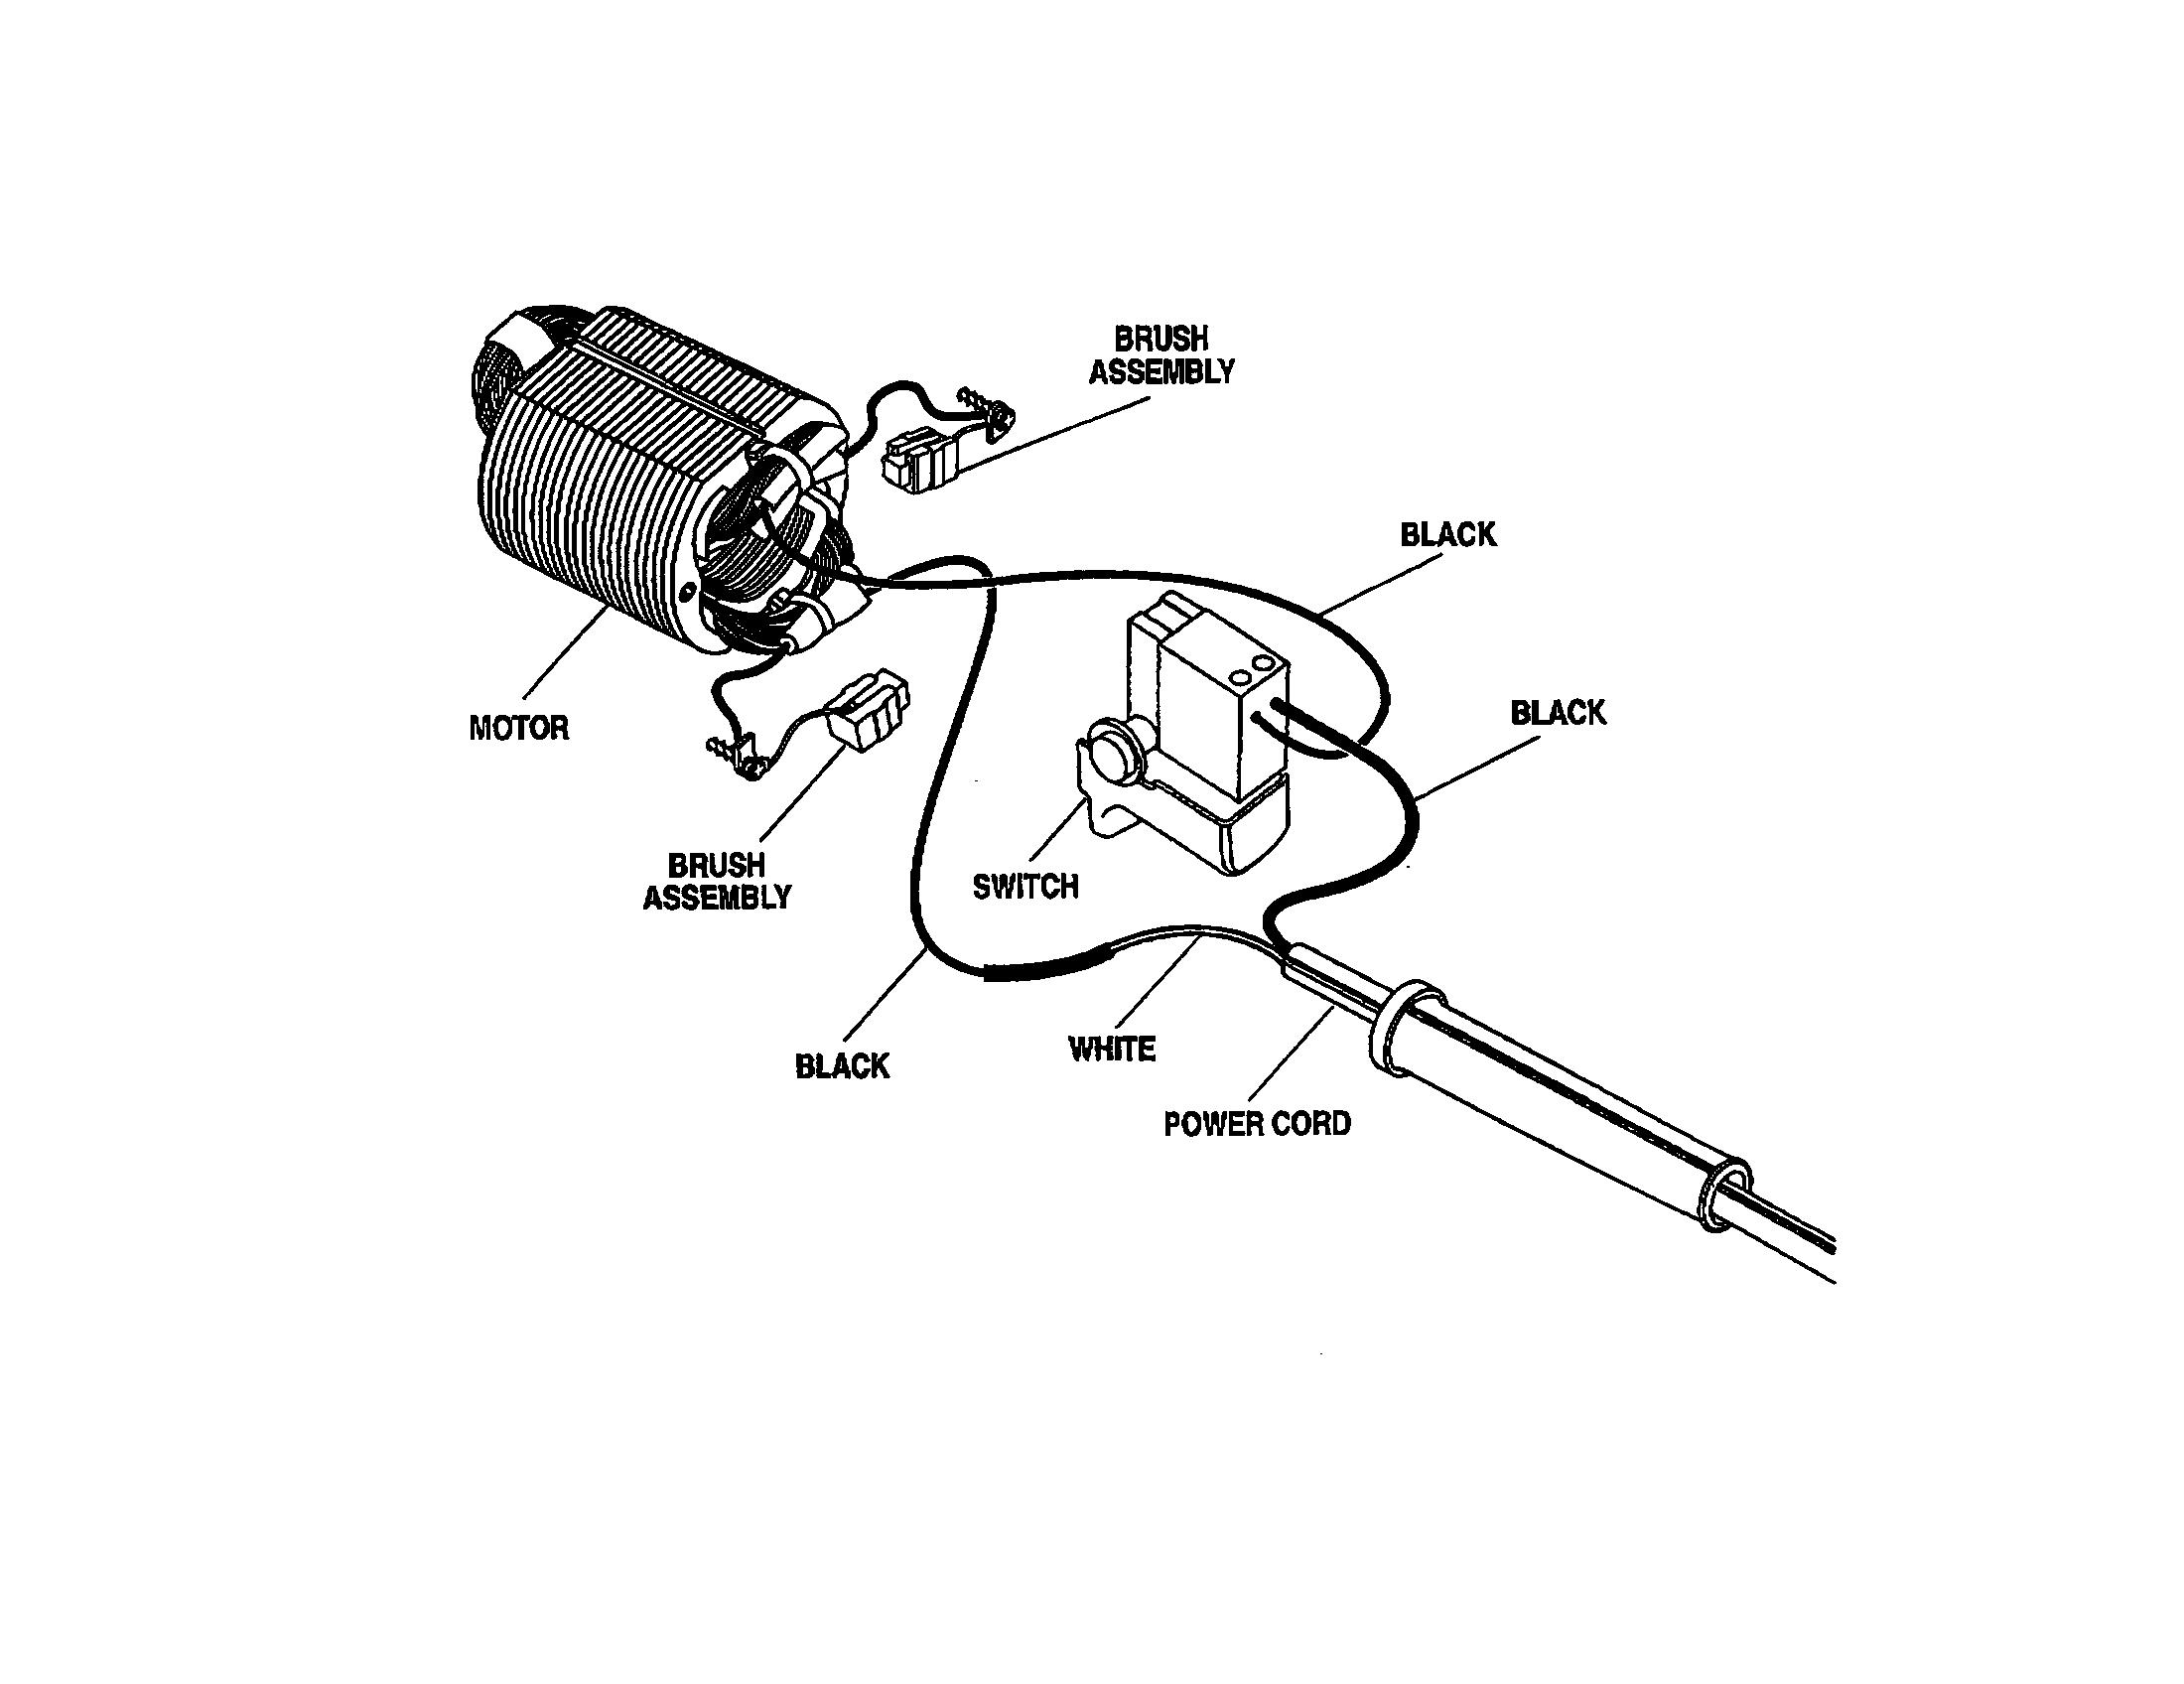 medium resolution of grinder wiring diagram